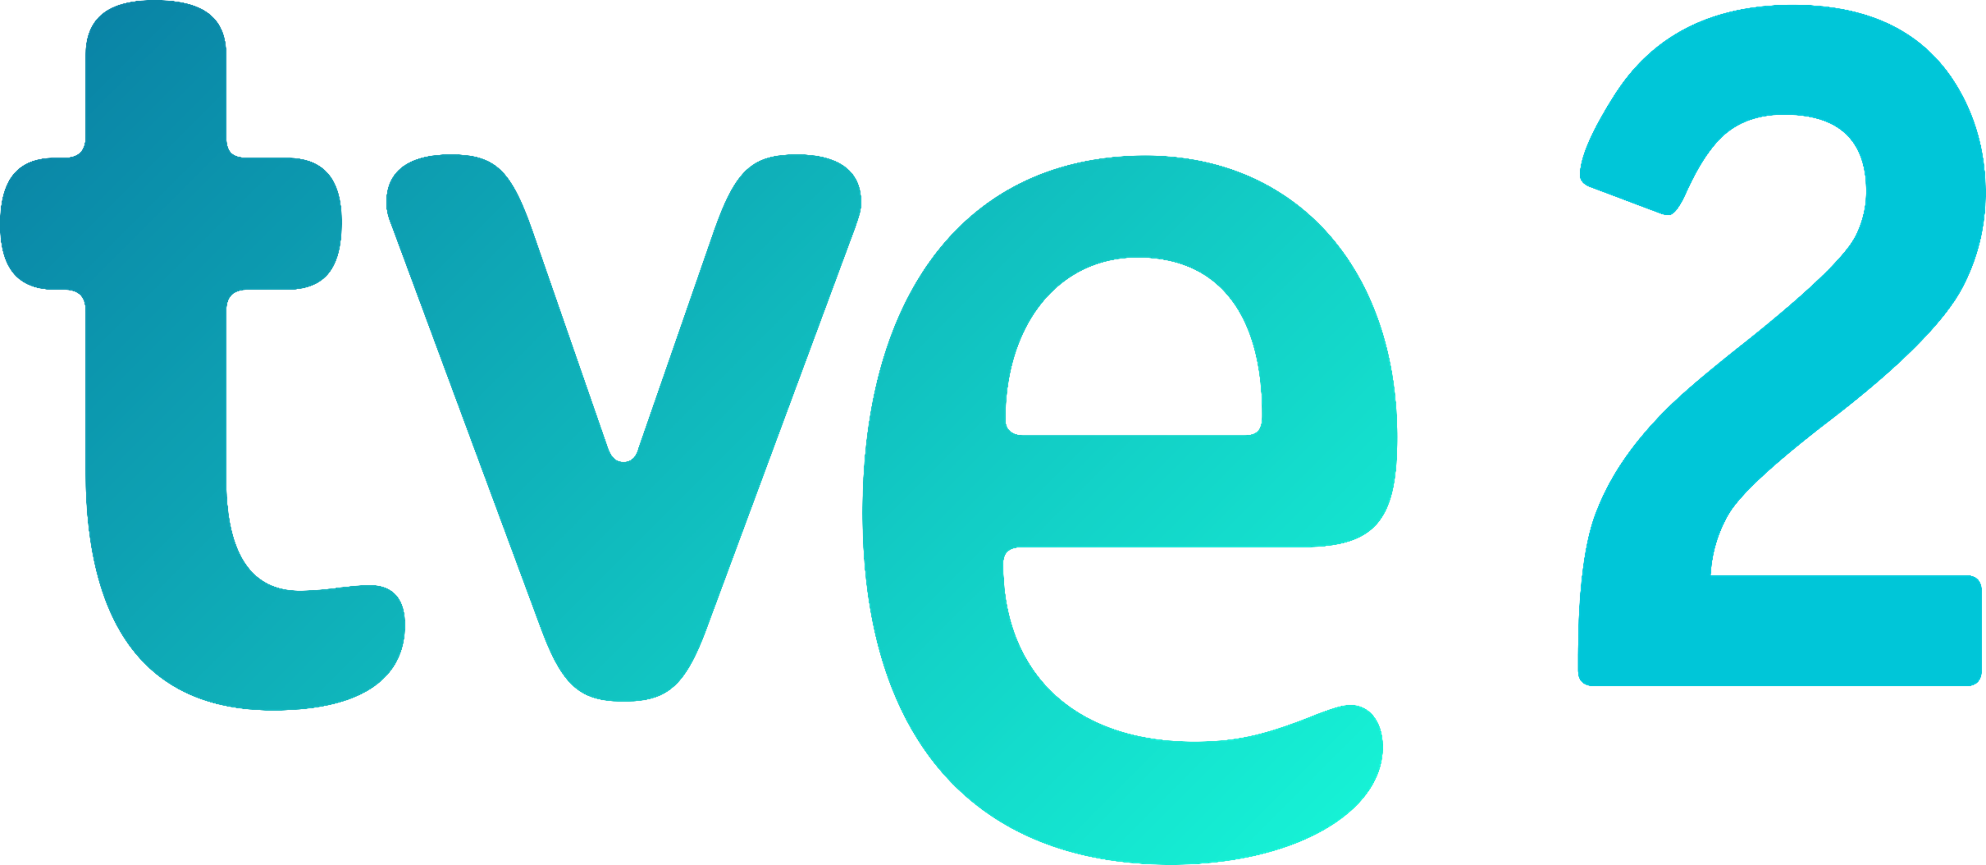 File:TVE2 logo 2008.png